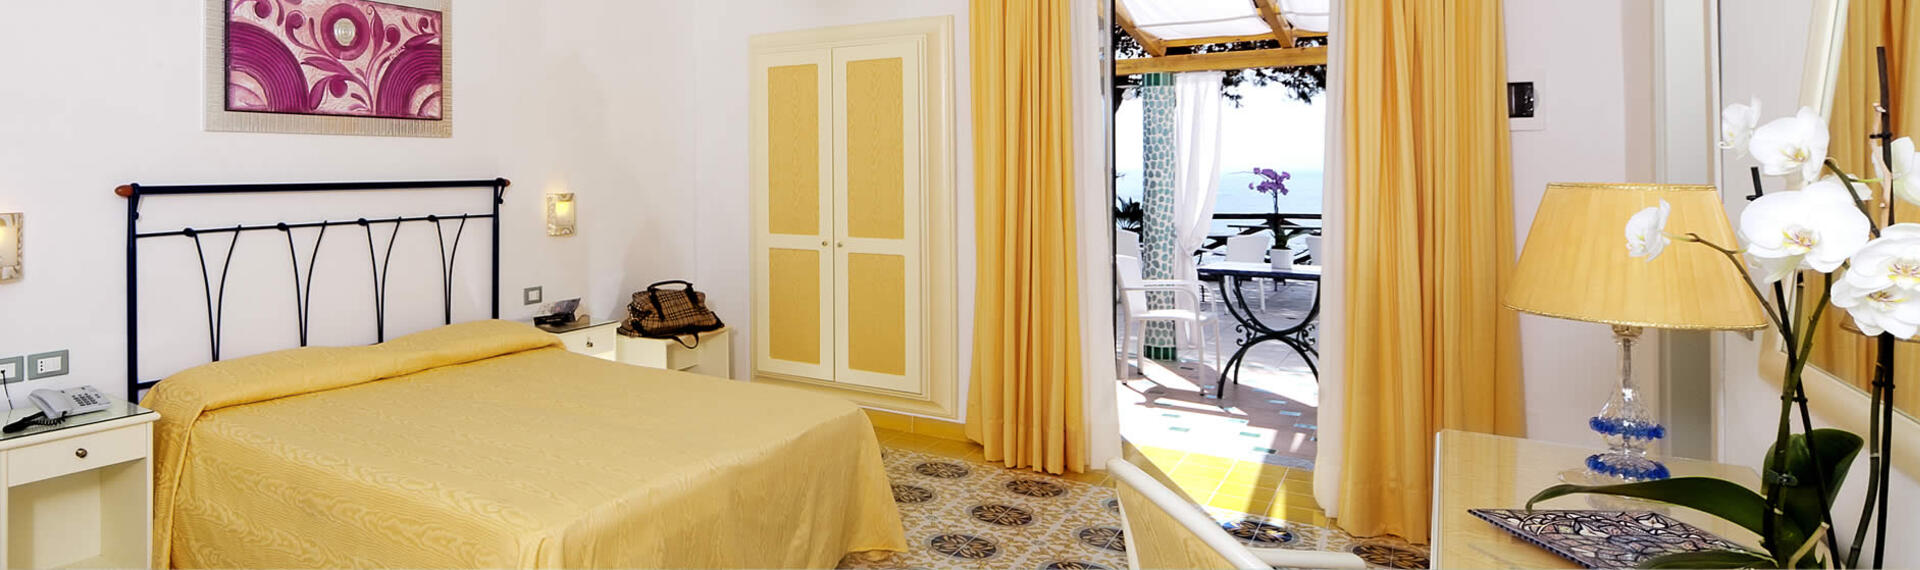 hotelvillabianca it vacanza-sicura 010